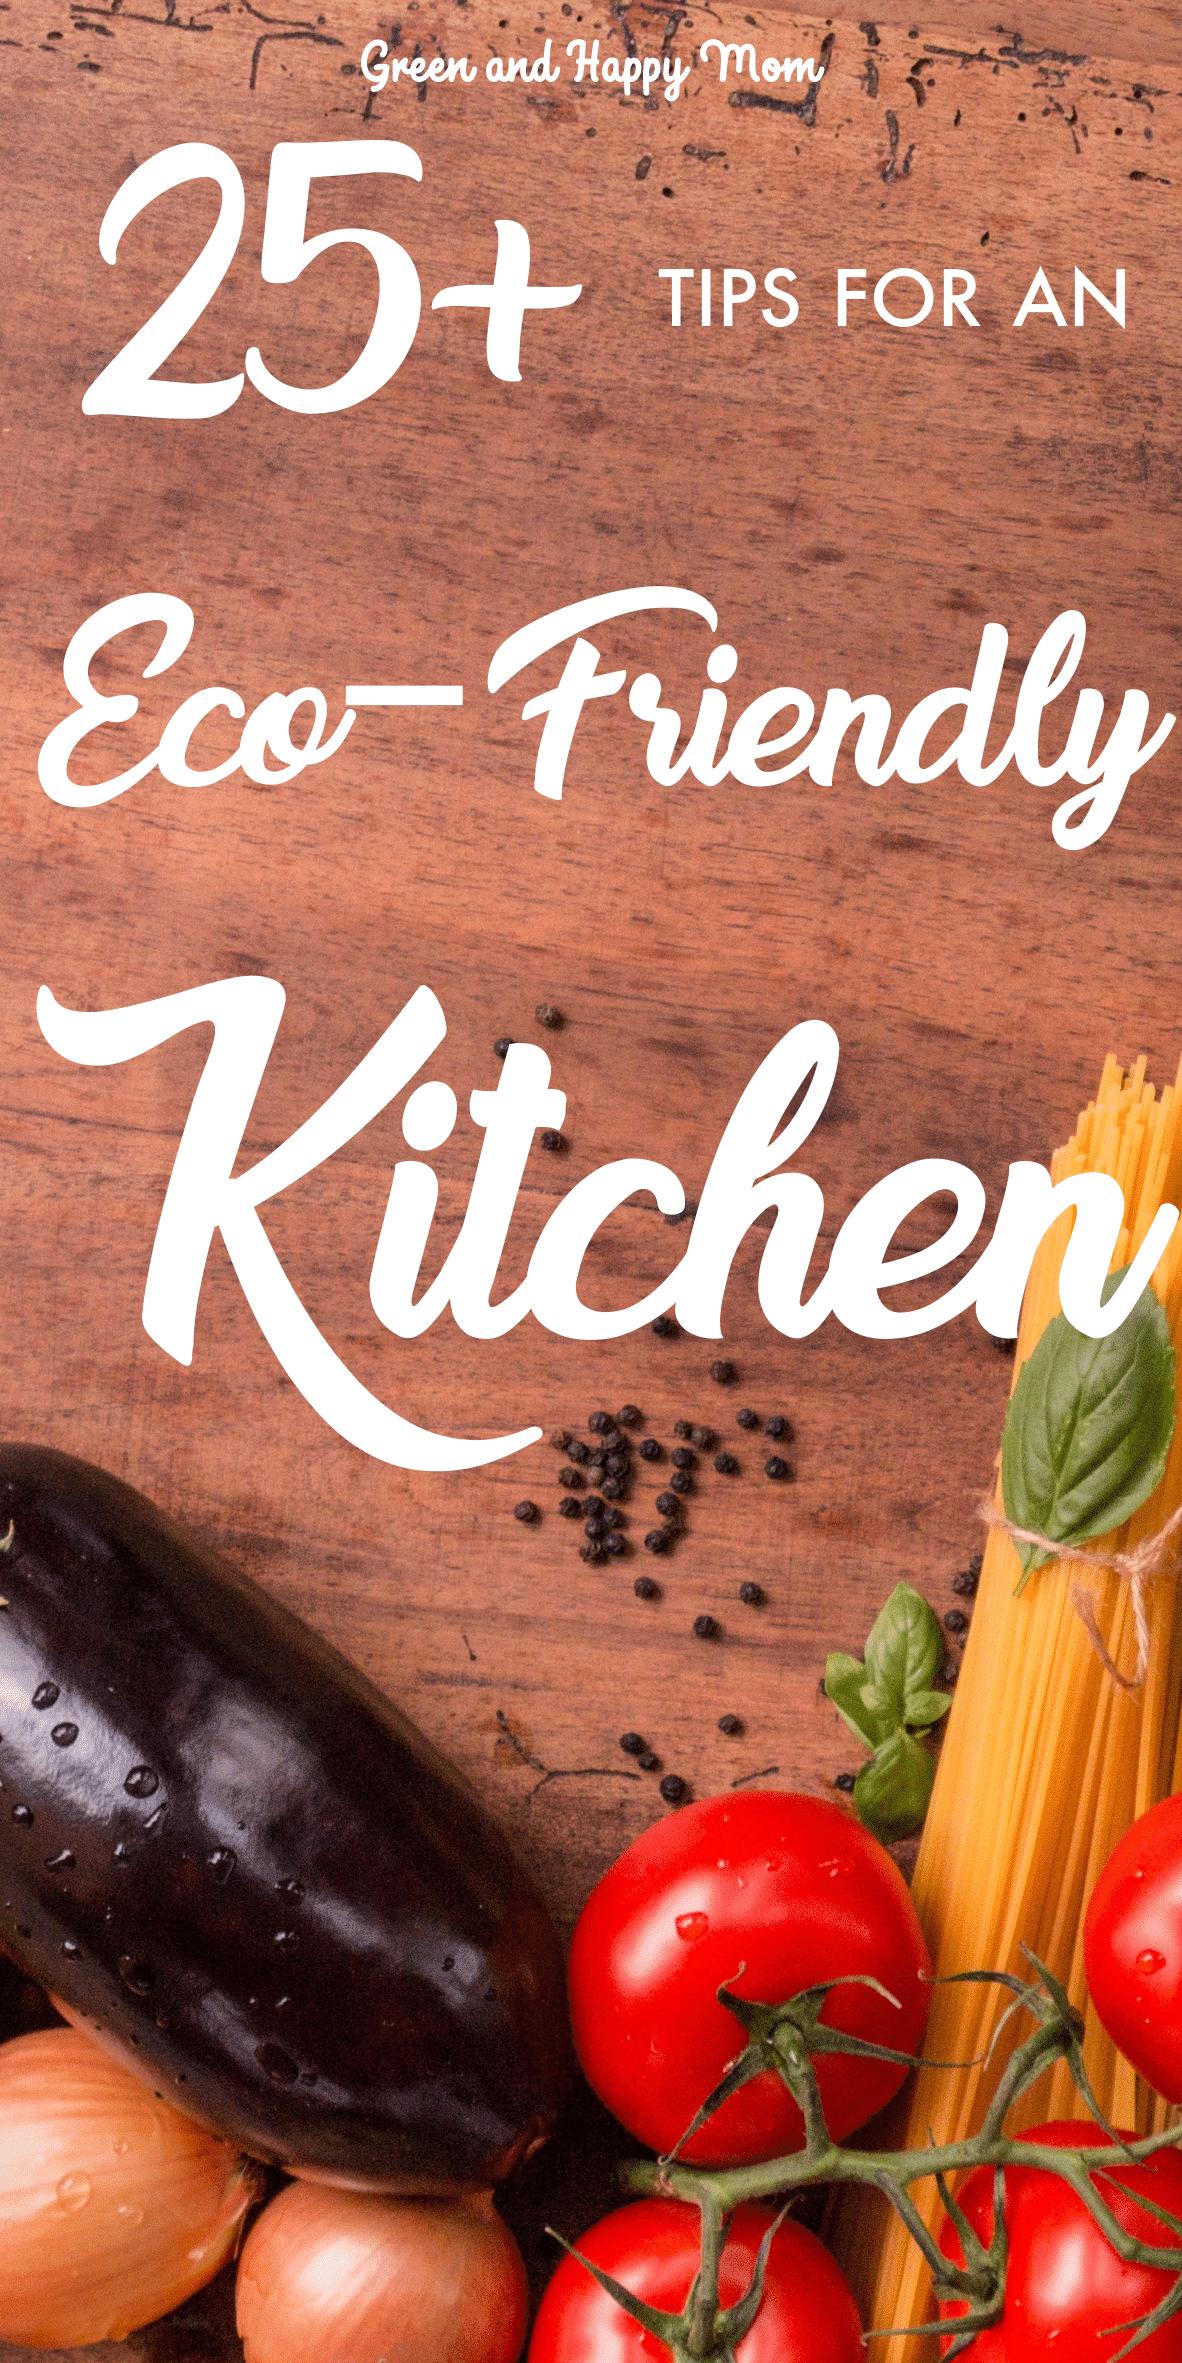 25 tips for a zero waste kitchen eco friendly kitchen zero waste kitchen plastic free kitchen on zero waste kitchen interior id=20754